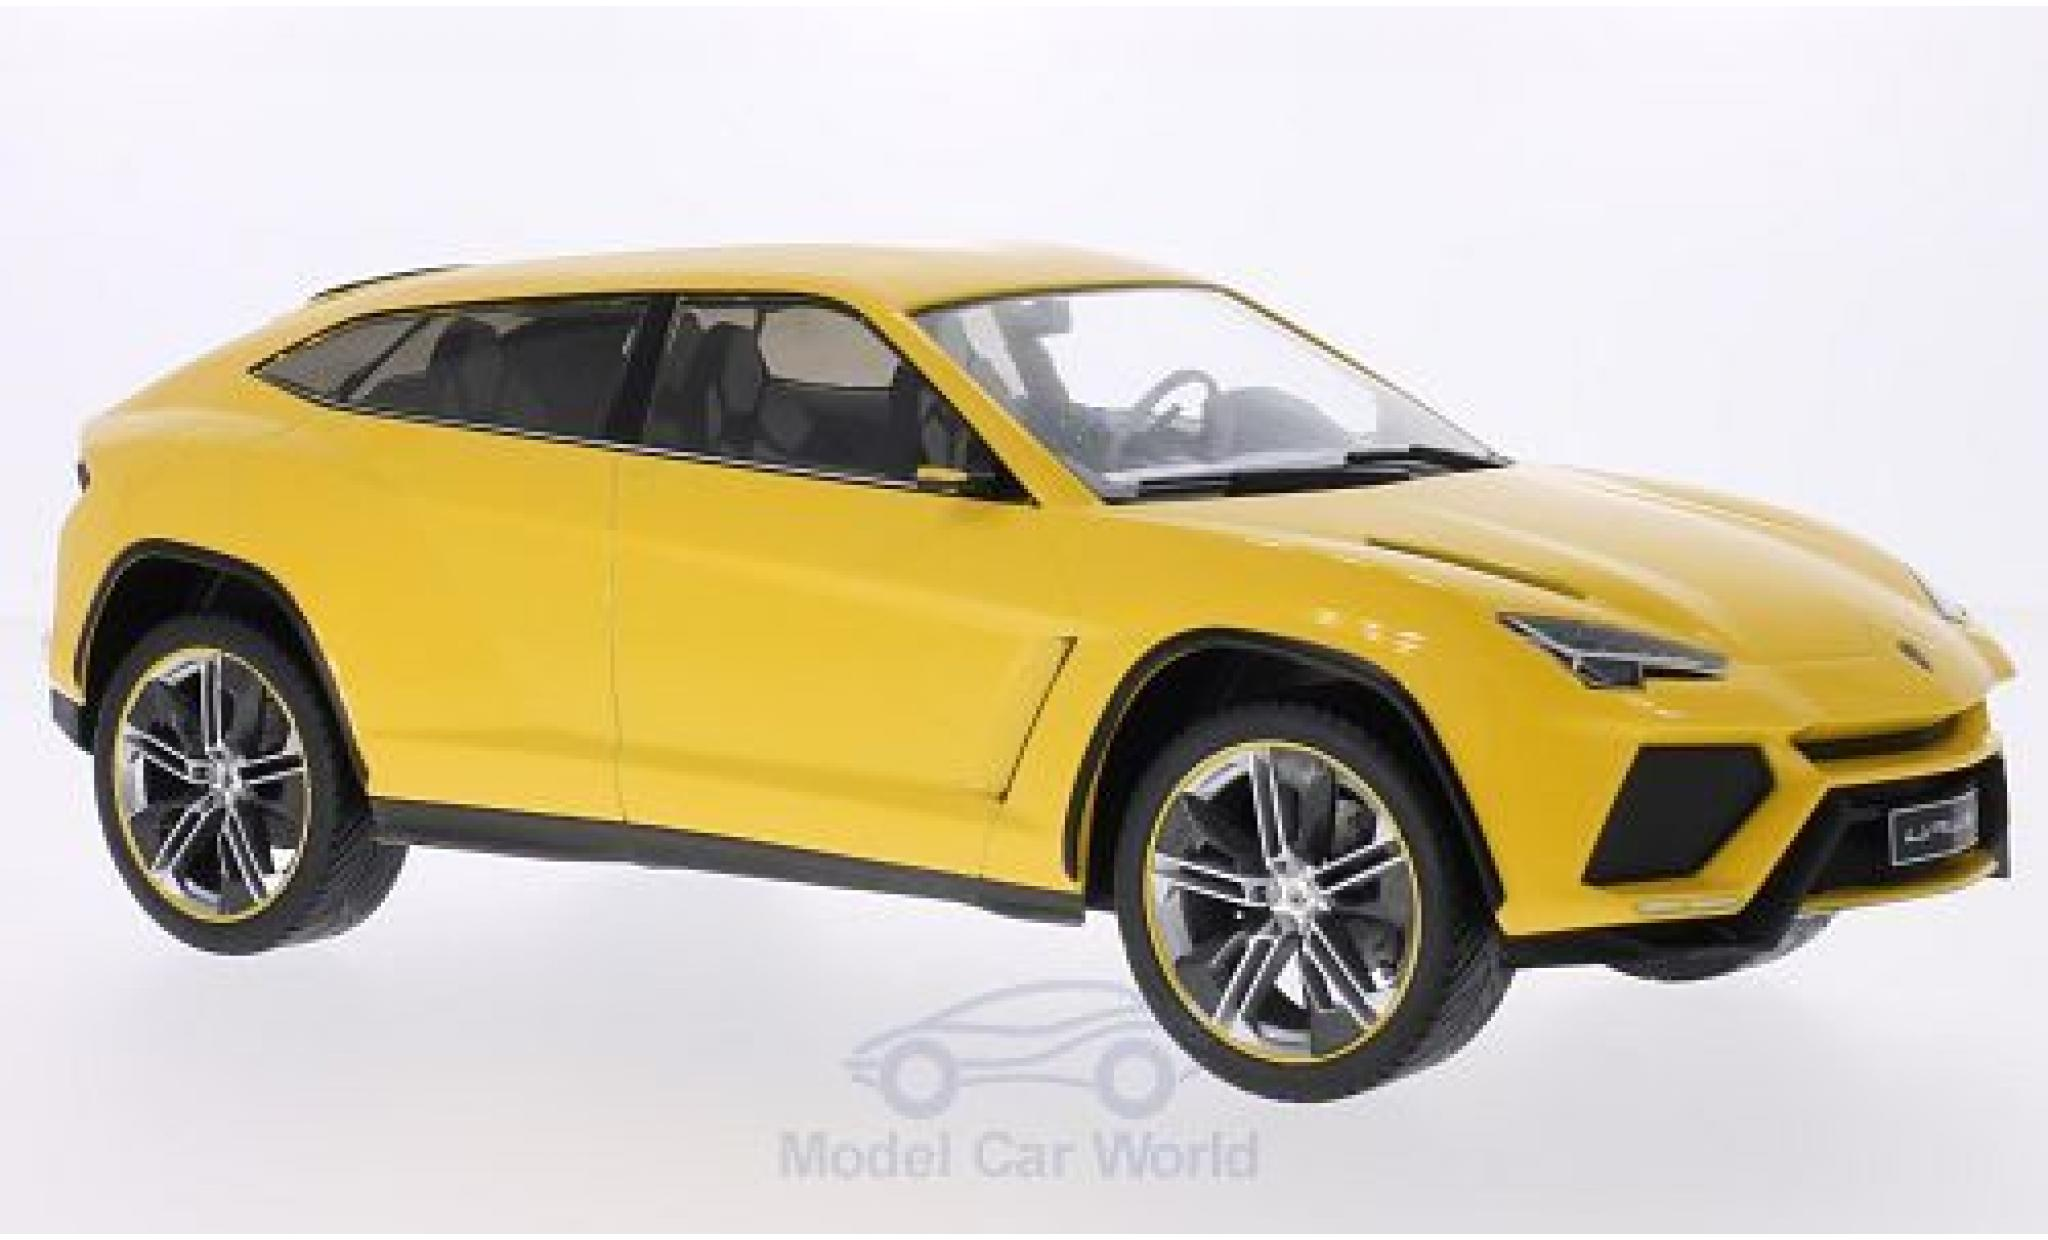 Lamborghini Urus 1/18 MCG metallise yellow 2012 Türen und Hauben geschlossen